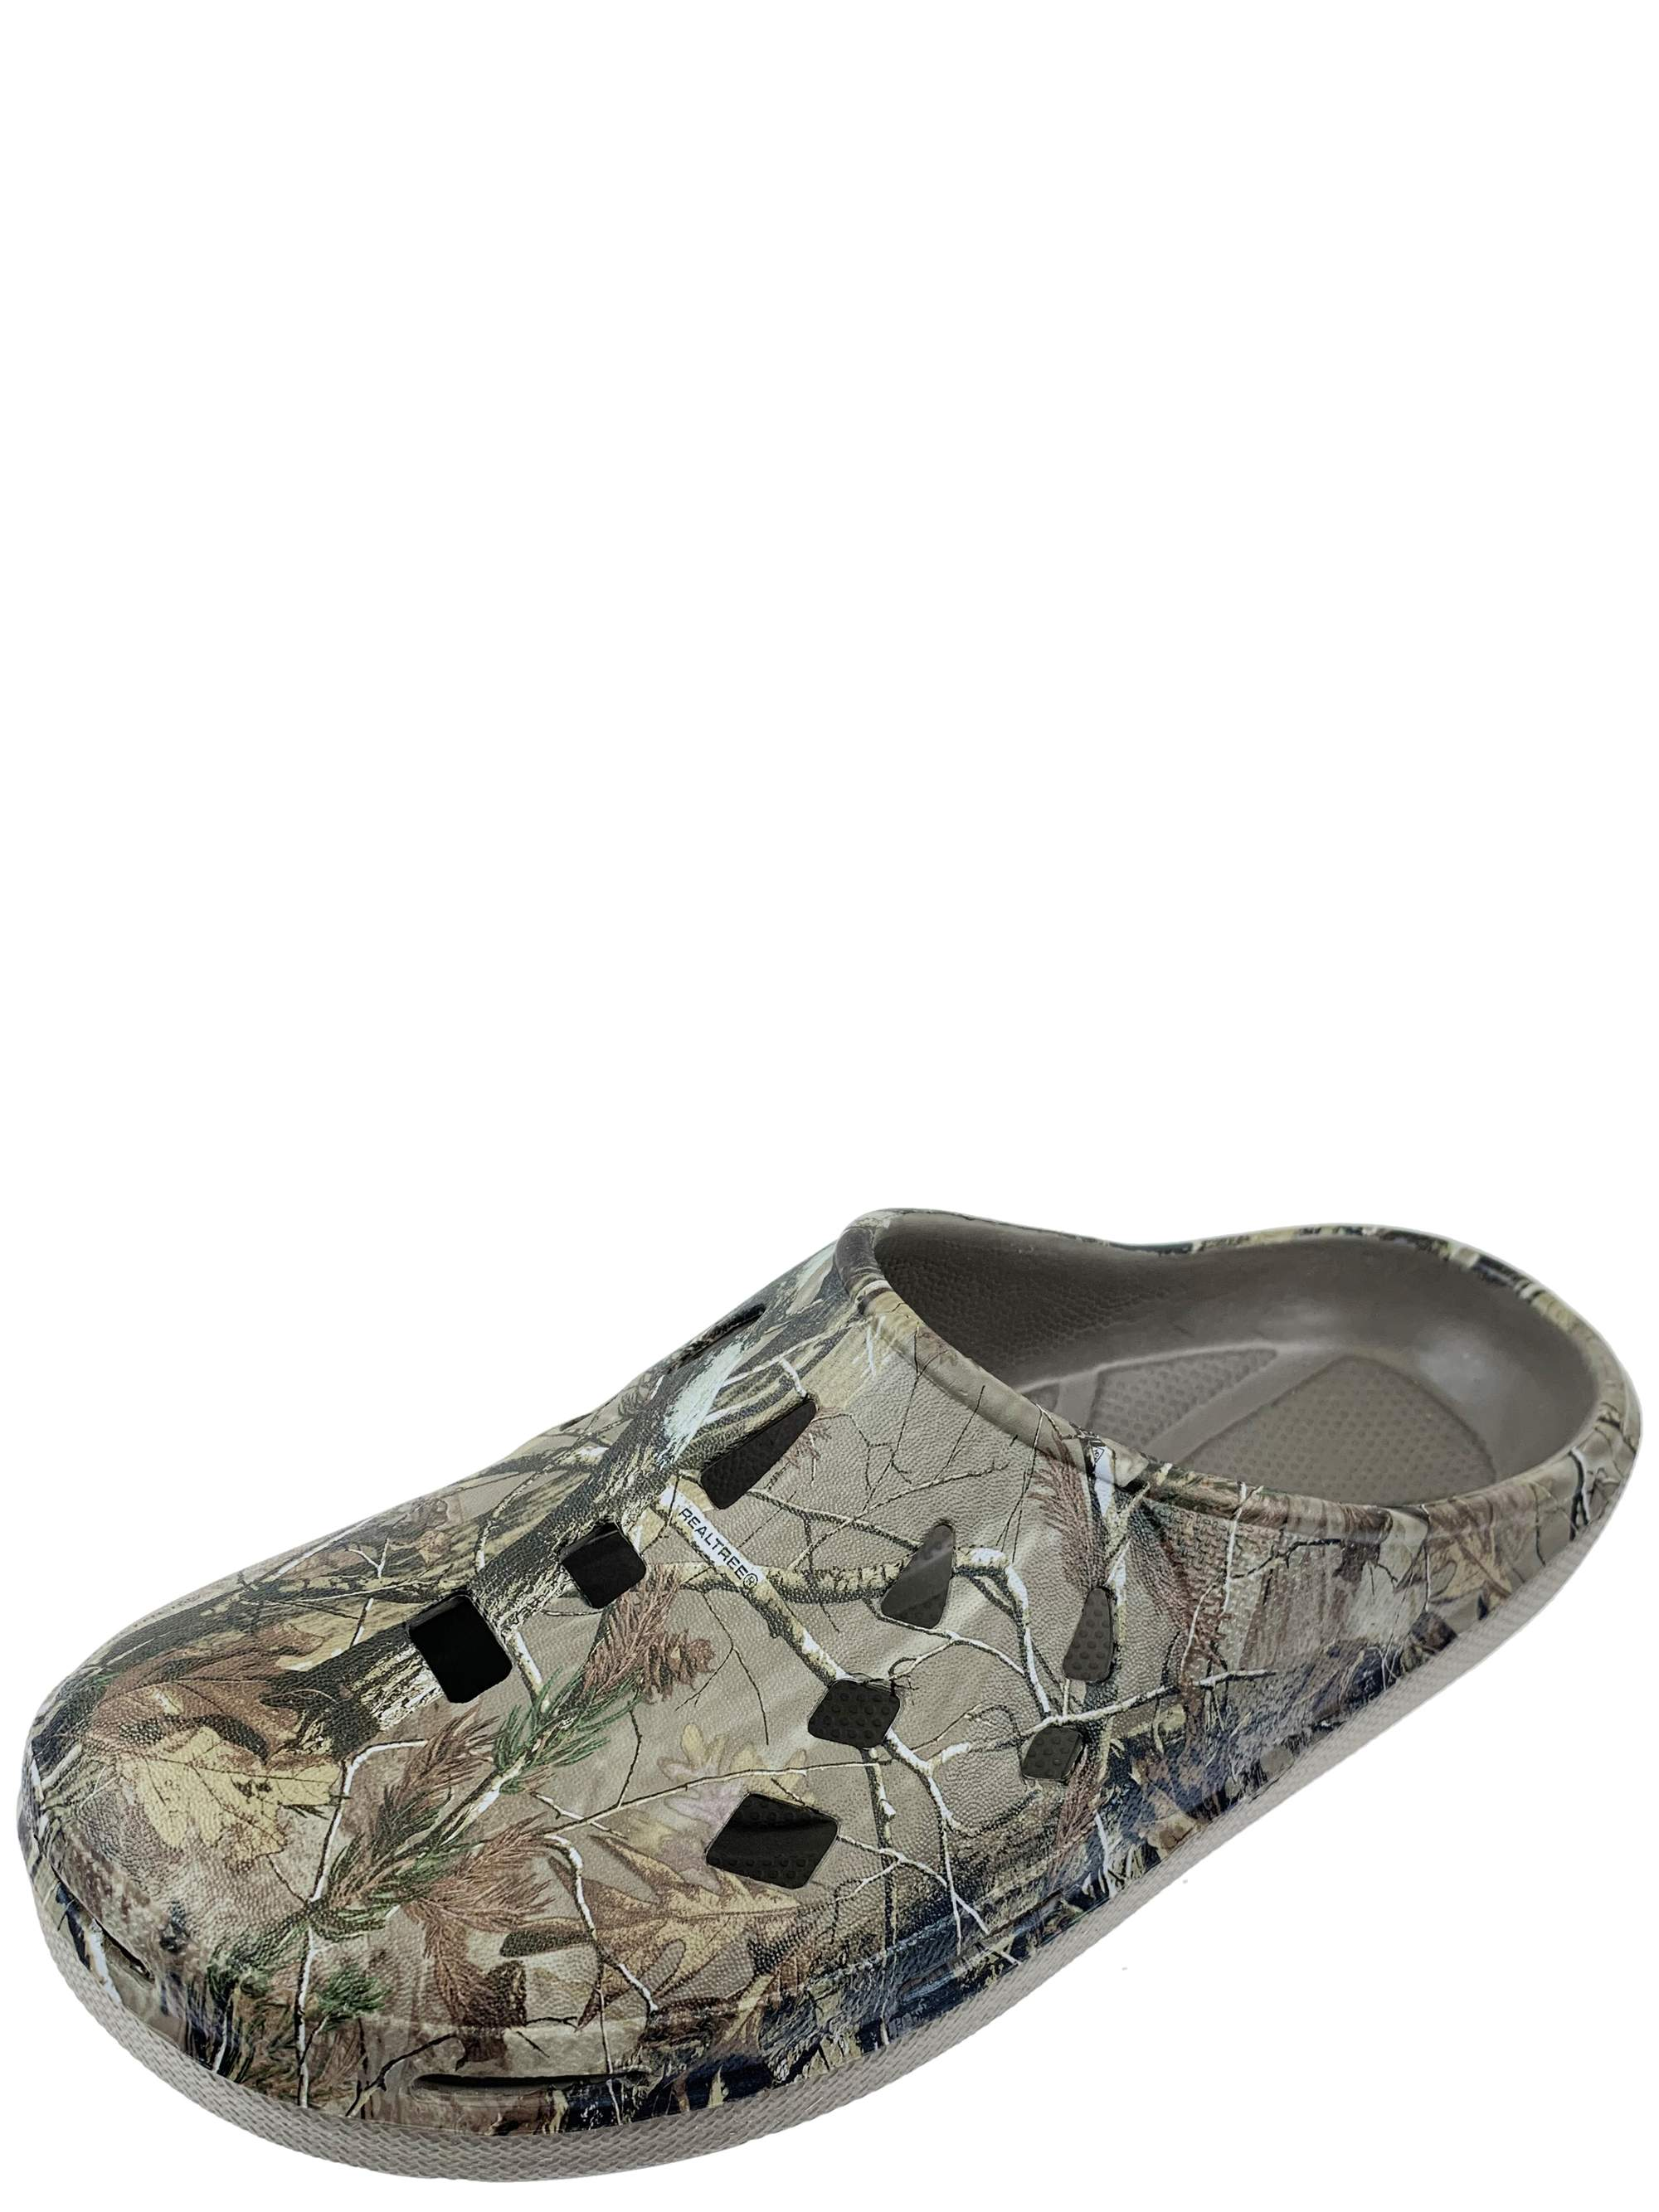 Realtree Men's Camouflage Clog Slip-on